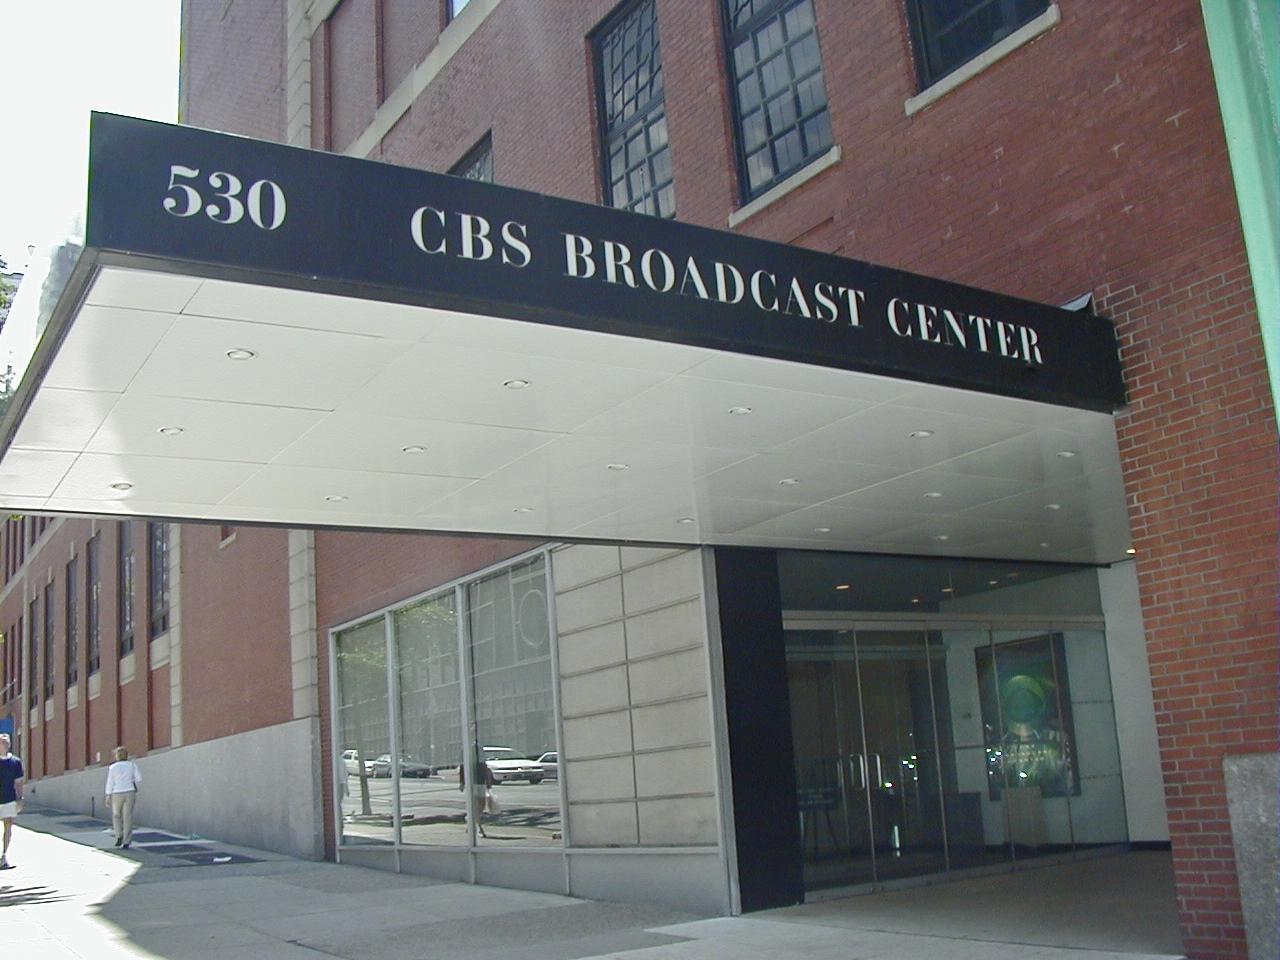 CBS Broadcast Center 530 West 57th street NYC